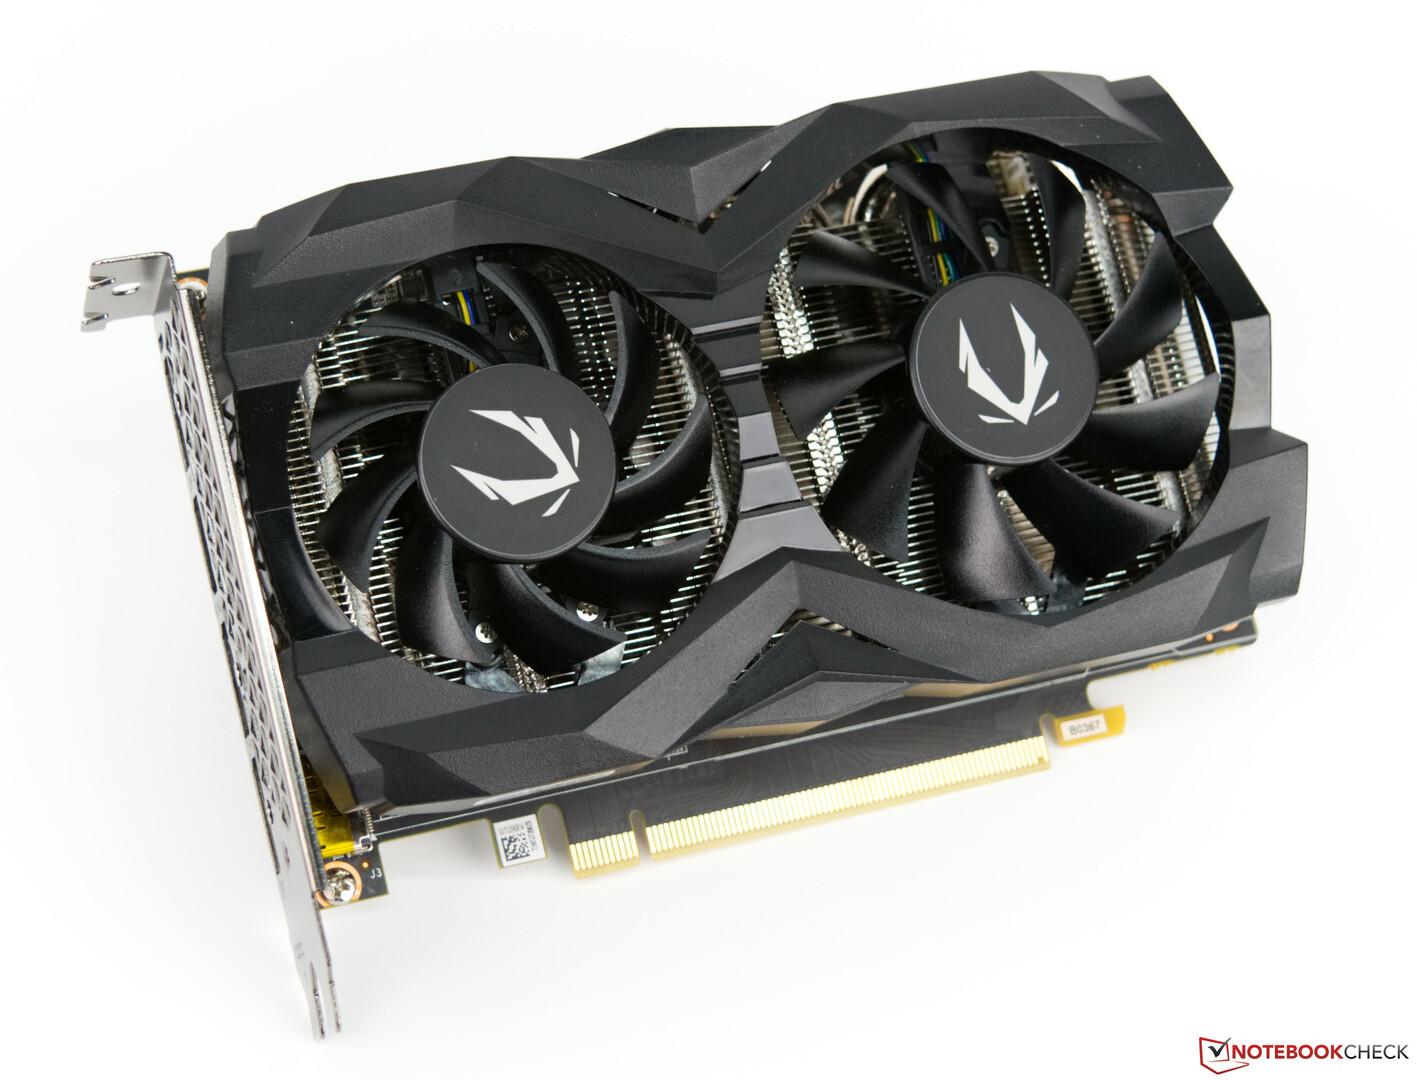 Zotac GeForce GTX 1660 Ti Desktop Graphics Card Review